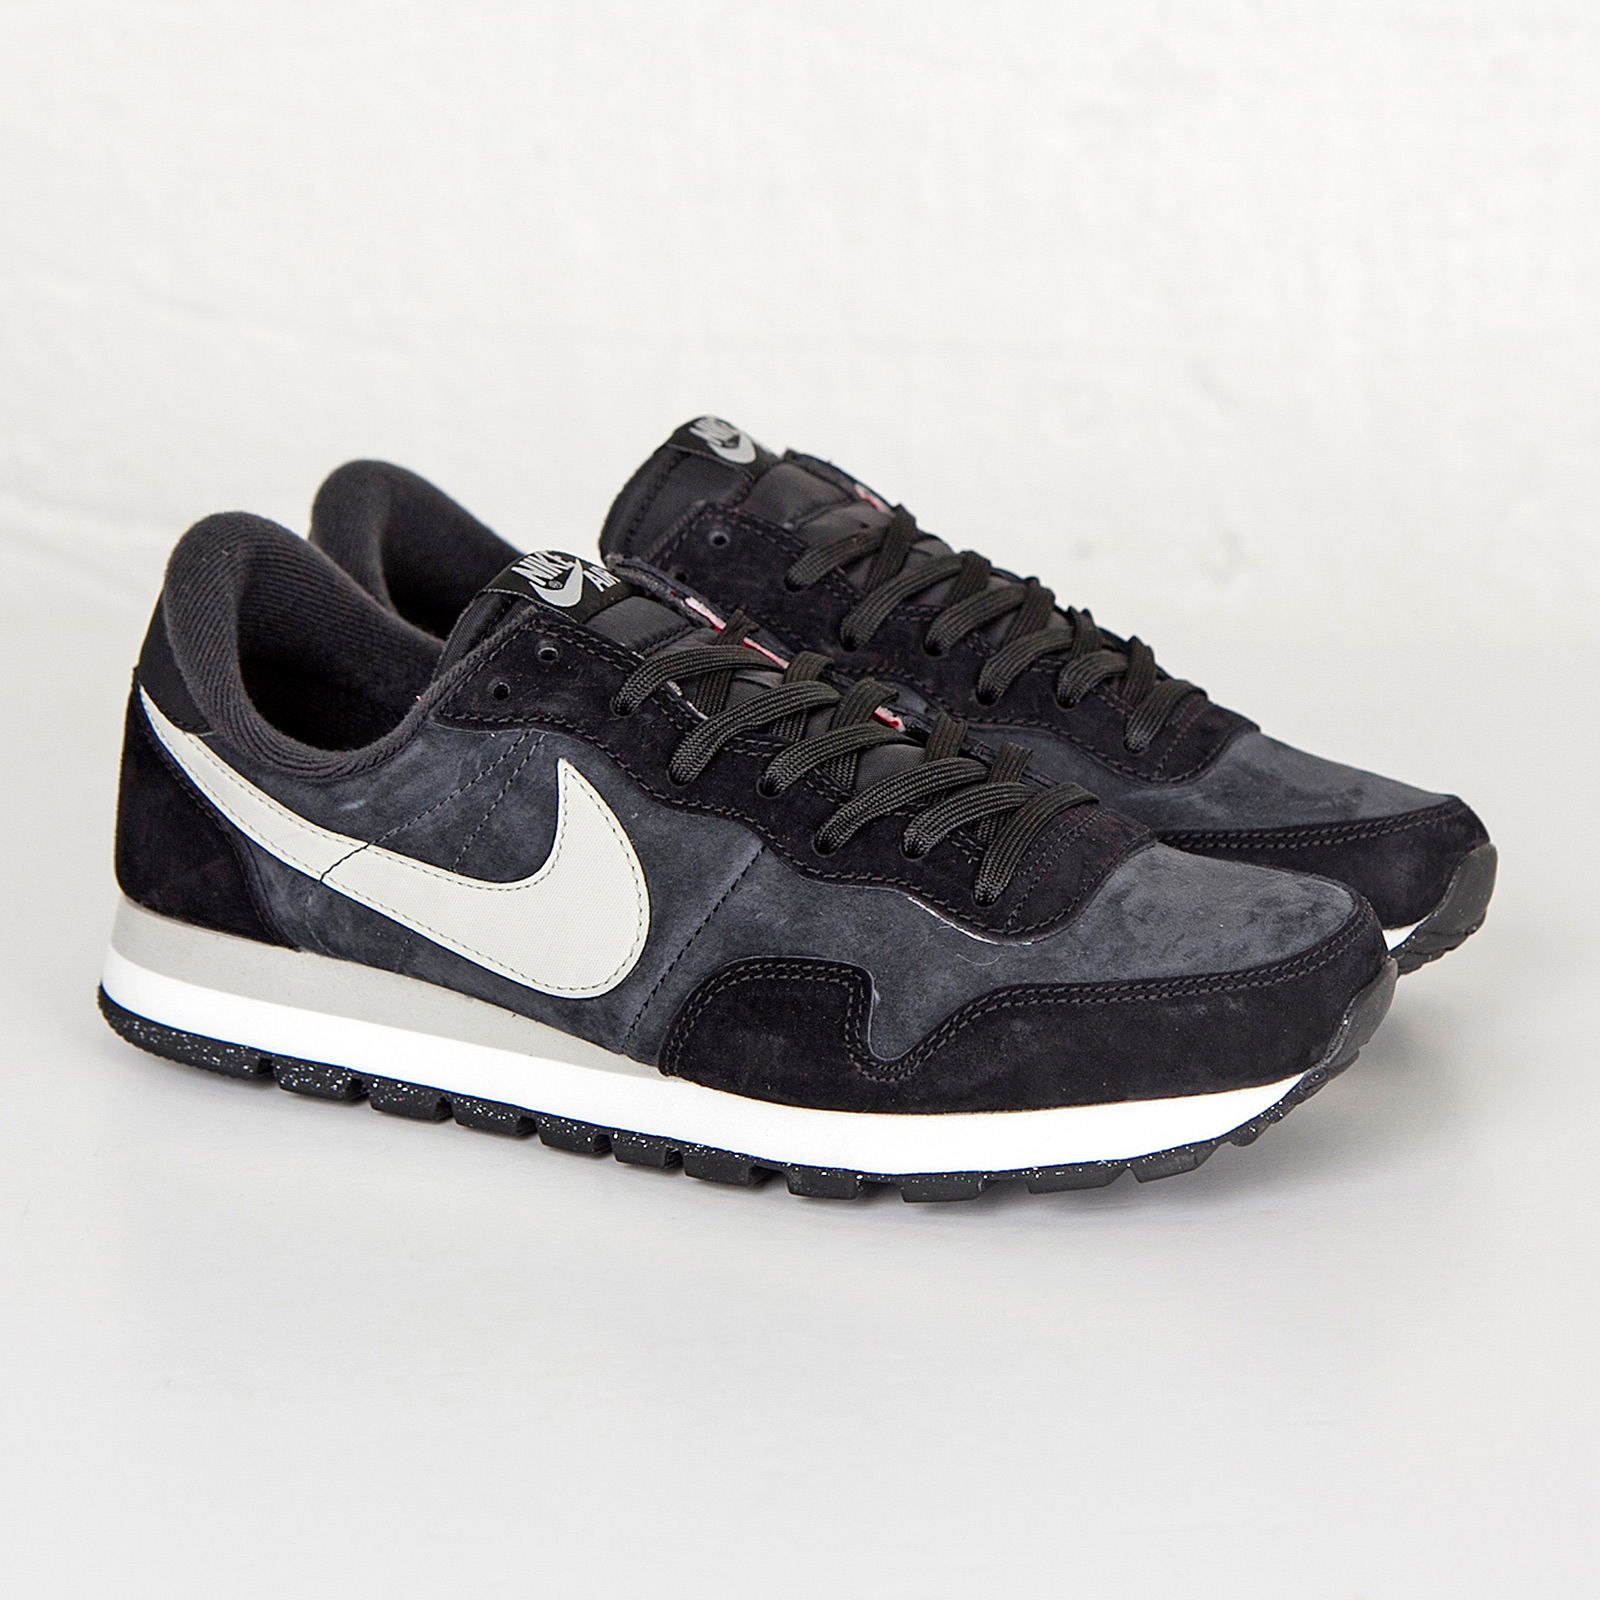 Nike Air Pegasus 83 LTR - 616324-012 - SNS | sneakers & streetwear ...